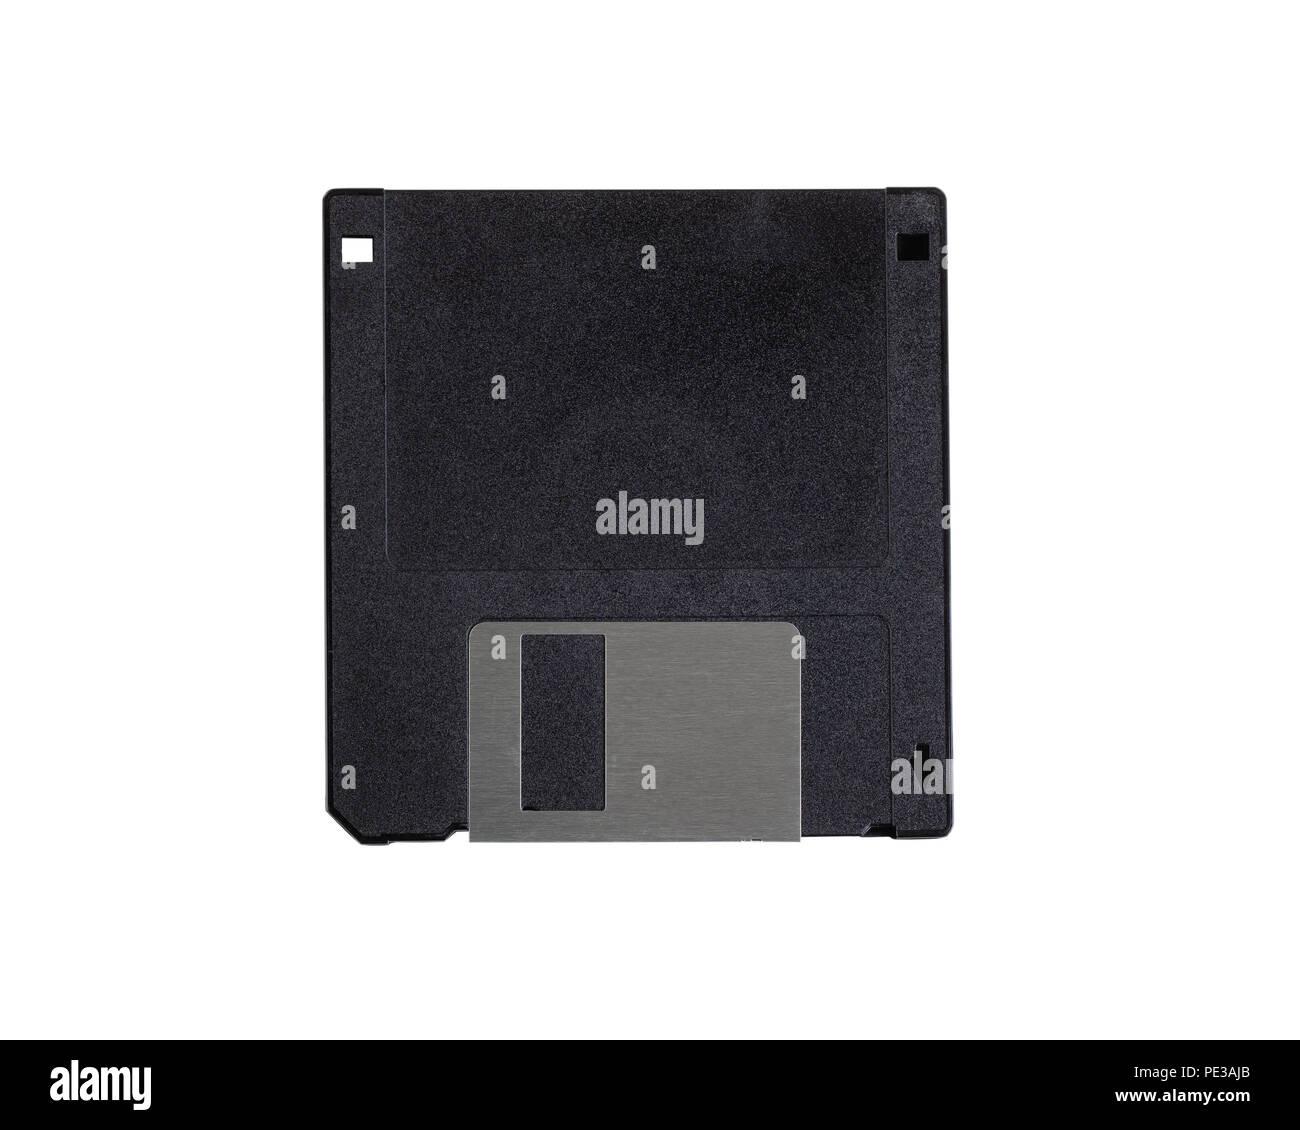 Old floppy disk isolated on white background - Stock Image